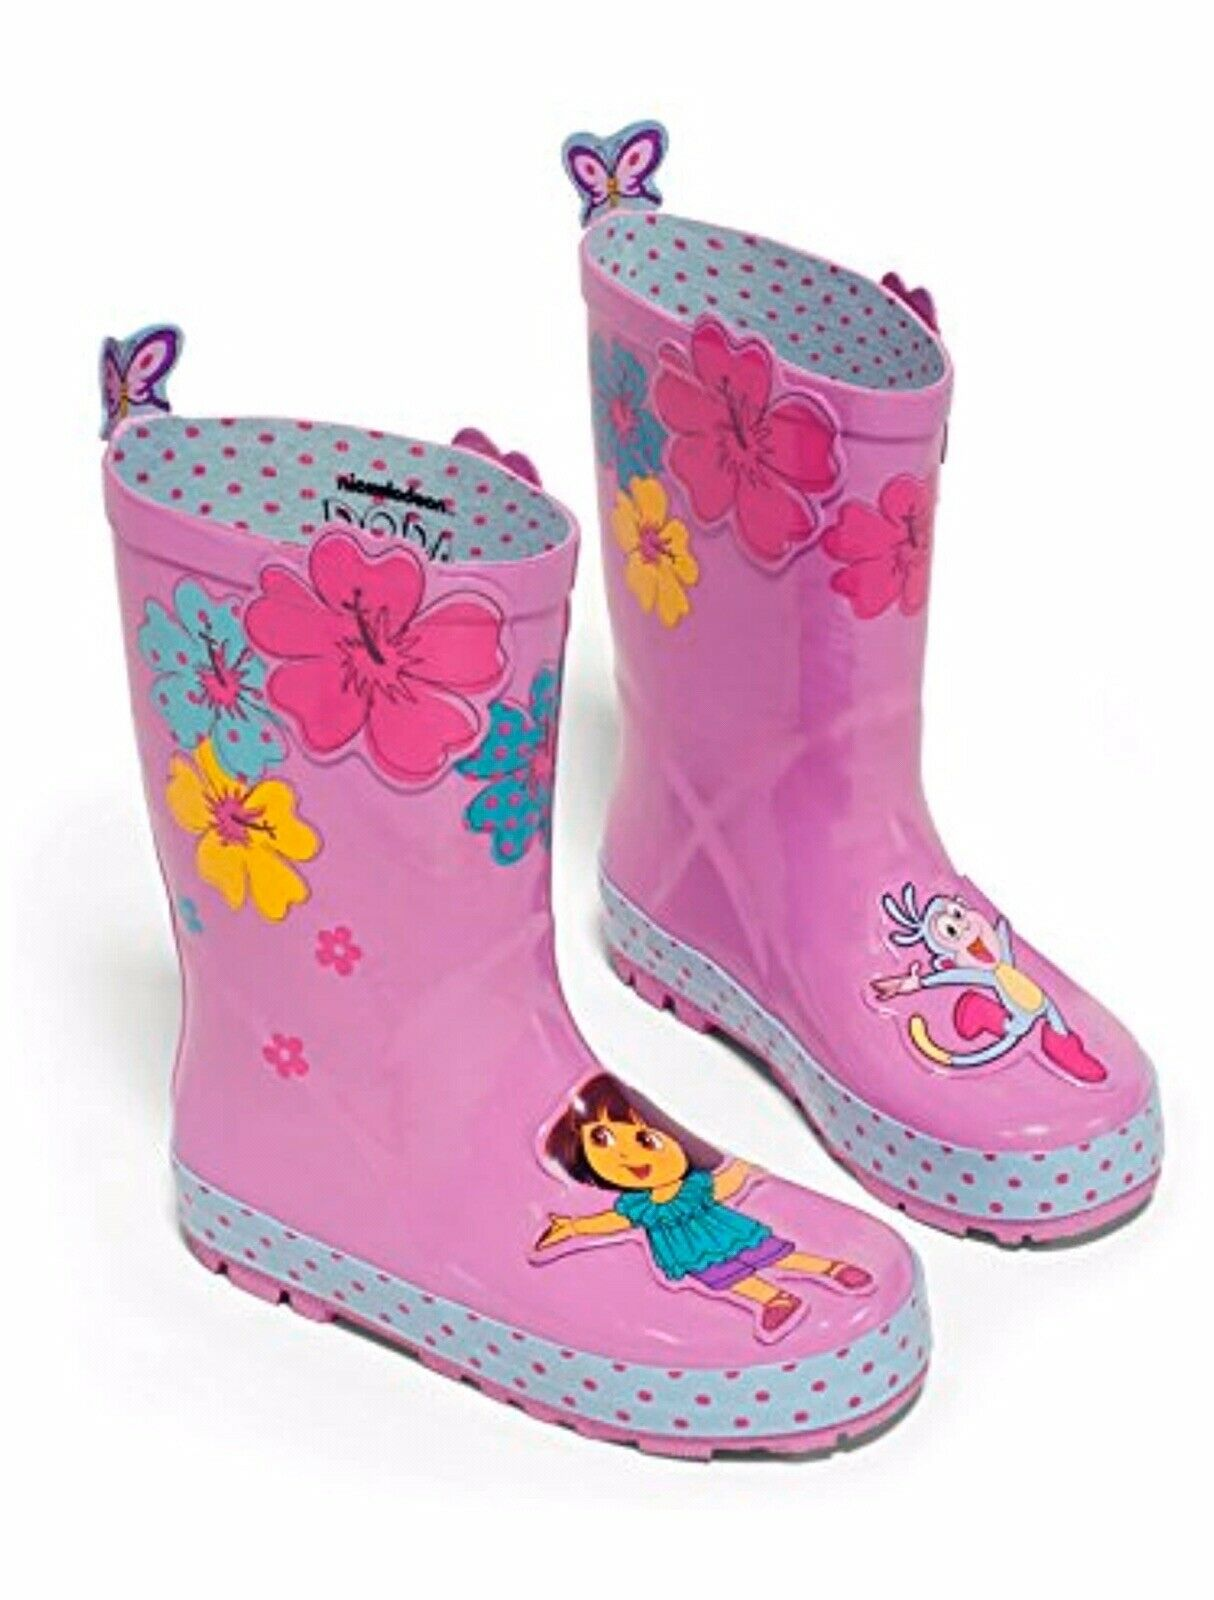 Kidorable Dora the Explorer Rain Boots